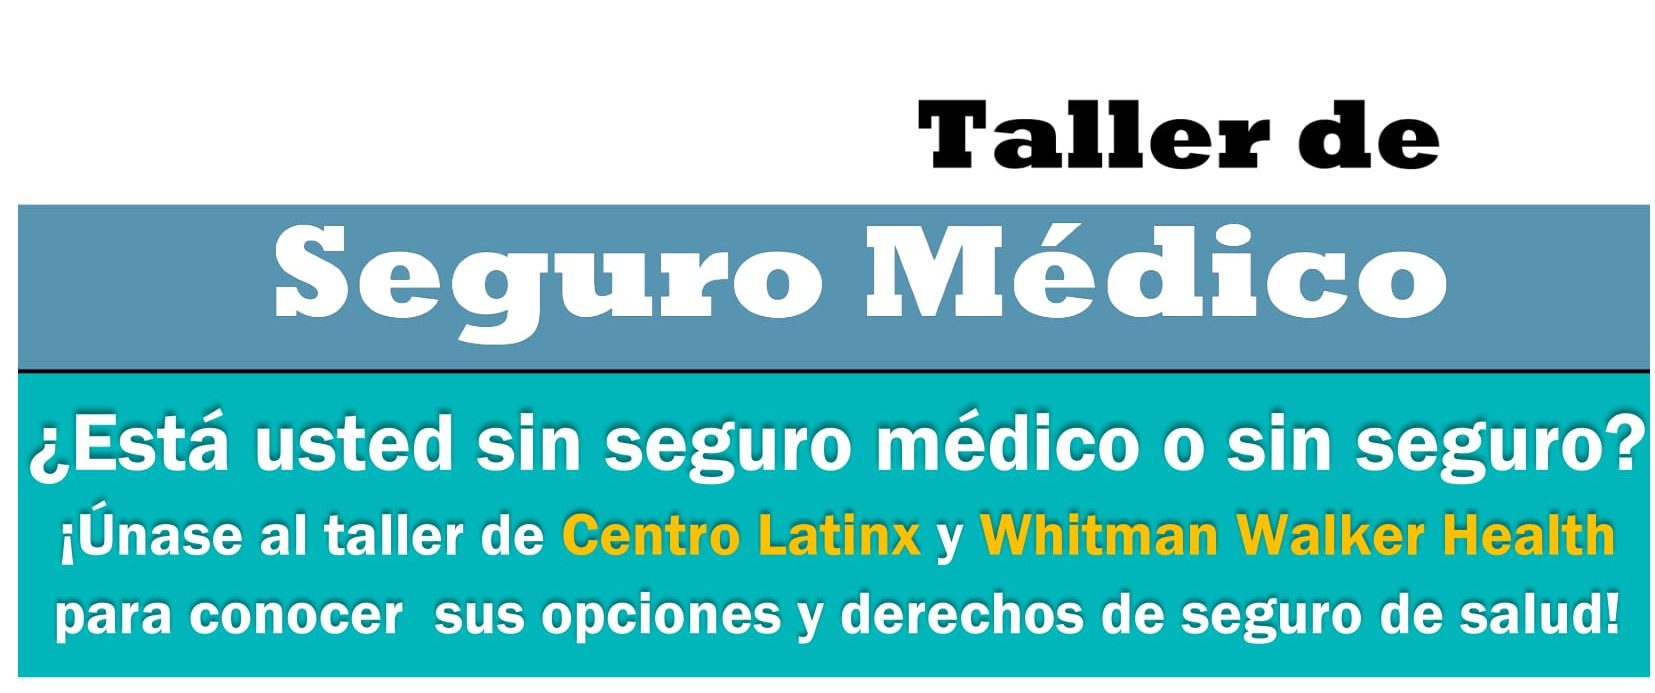 Taller de Seguro Medico